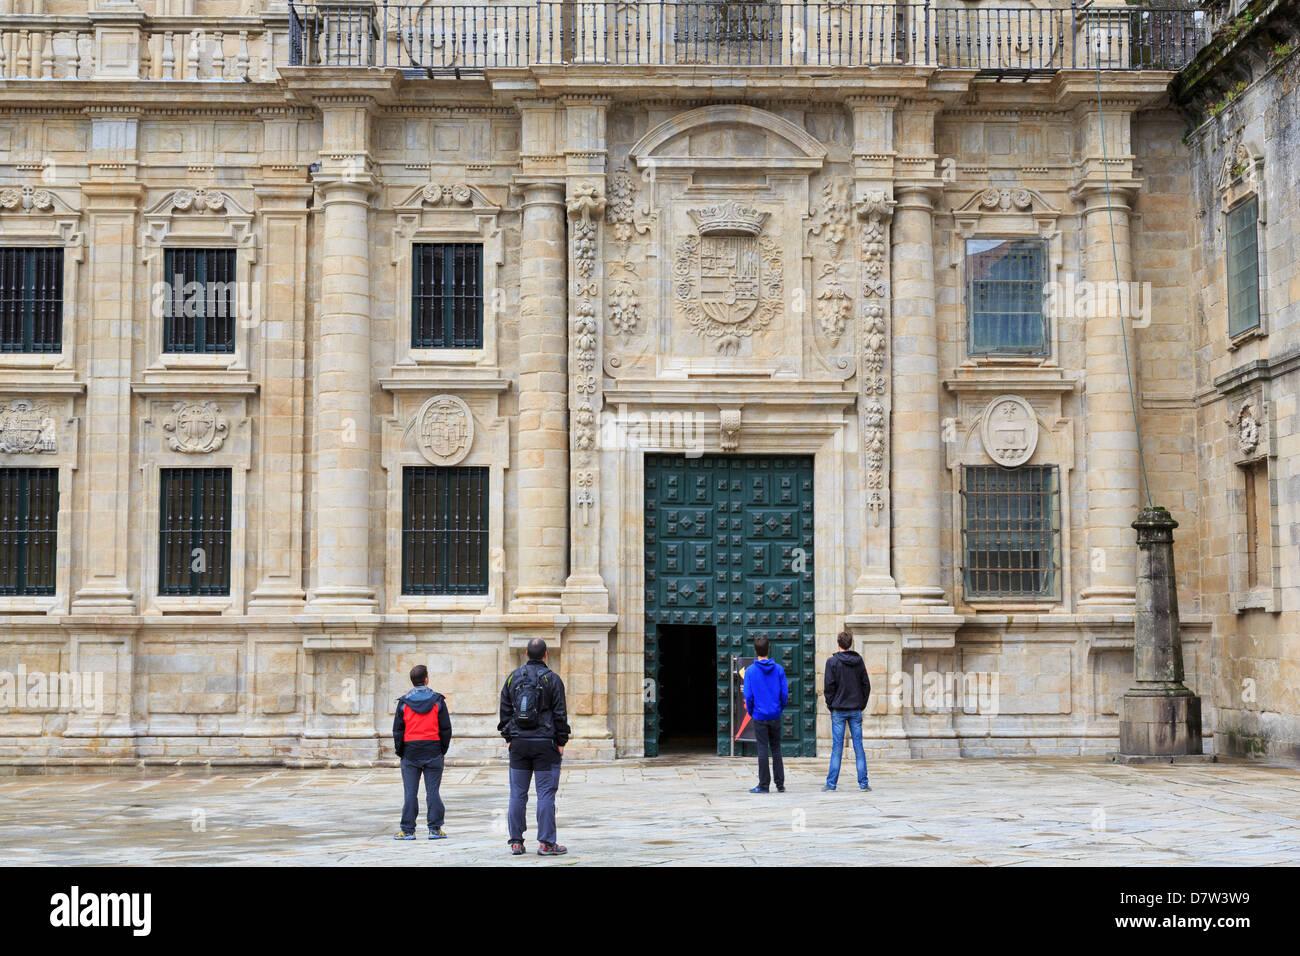 Cathedral entrance on Plaza Quintana, Santiago de Compostela, UNESCO World Heritage Site, Galicia, Spain Stock Photo